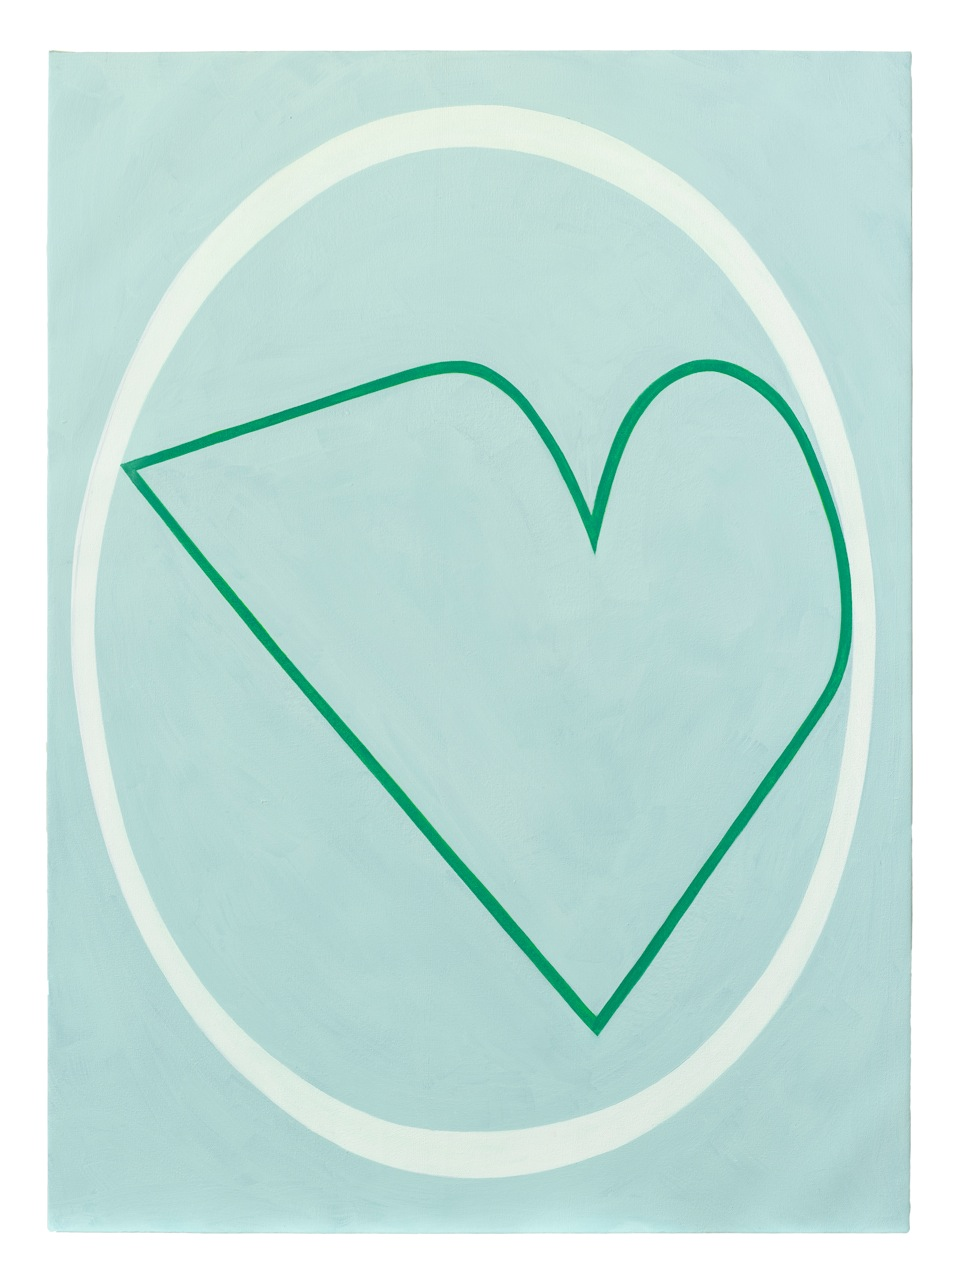 Jack Davidson | Hiram Butler Gallery